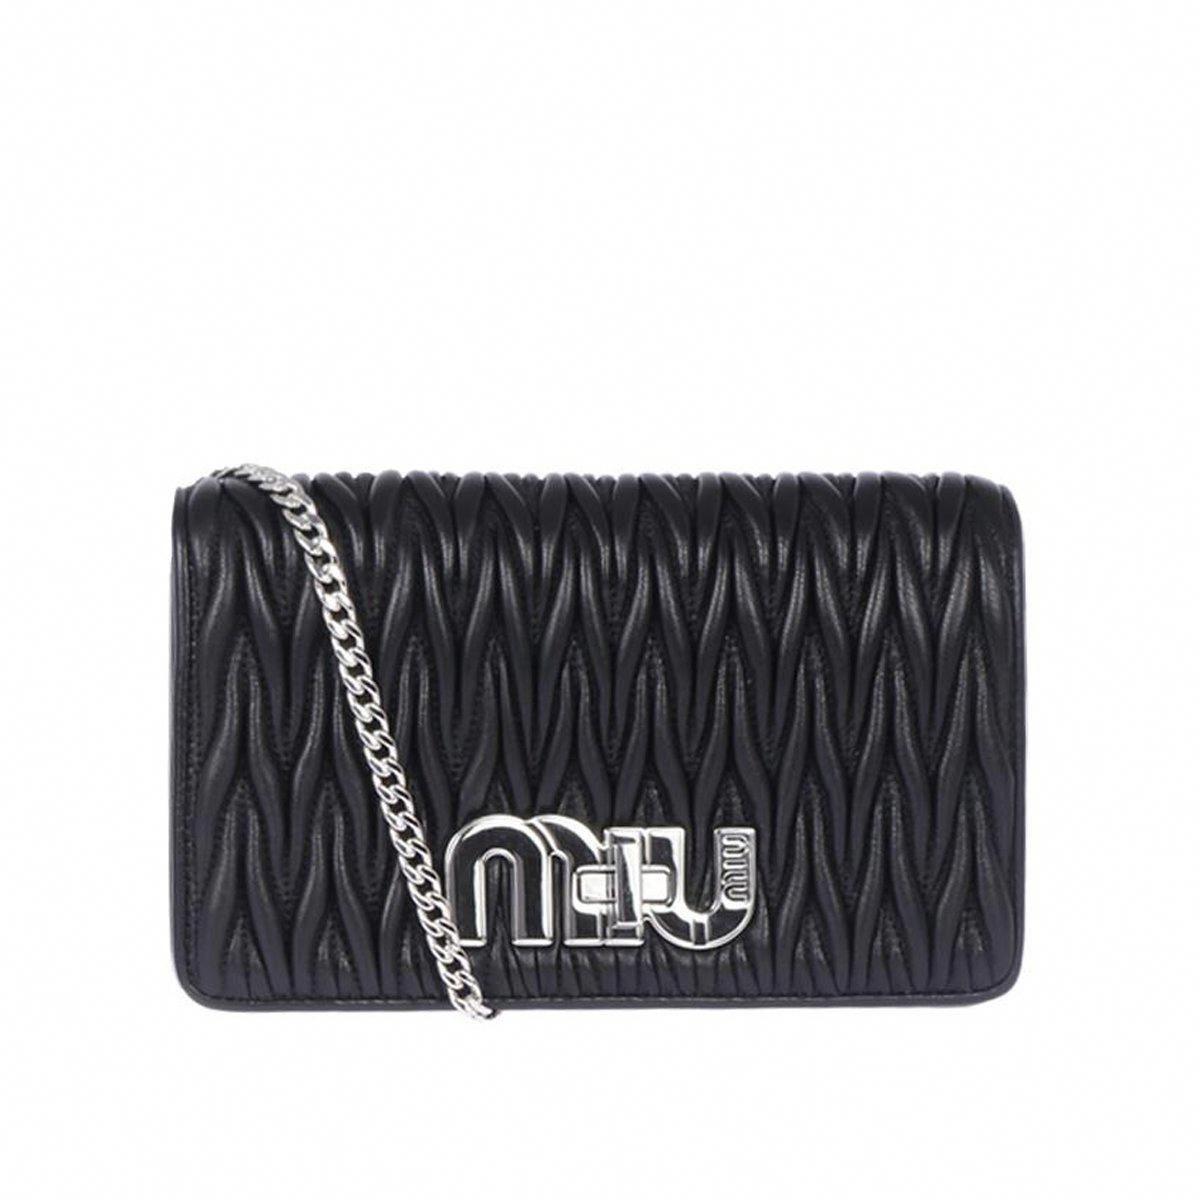 172948786a Miu Miu Prada Women s Black Tessuto Nylon Crossbody 5BF069  Prada  Fashion   QueenBee